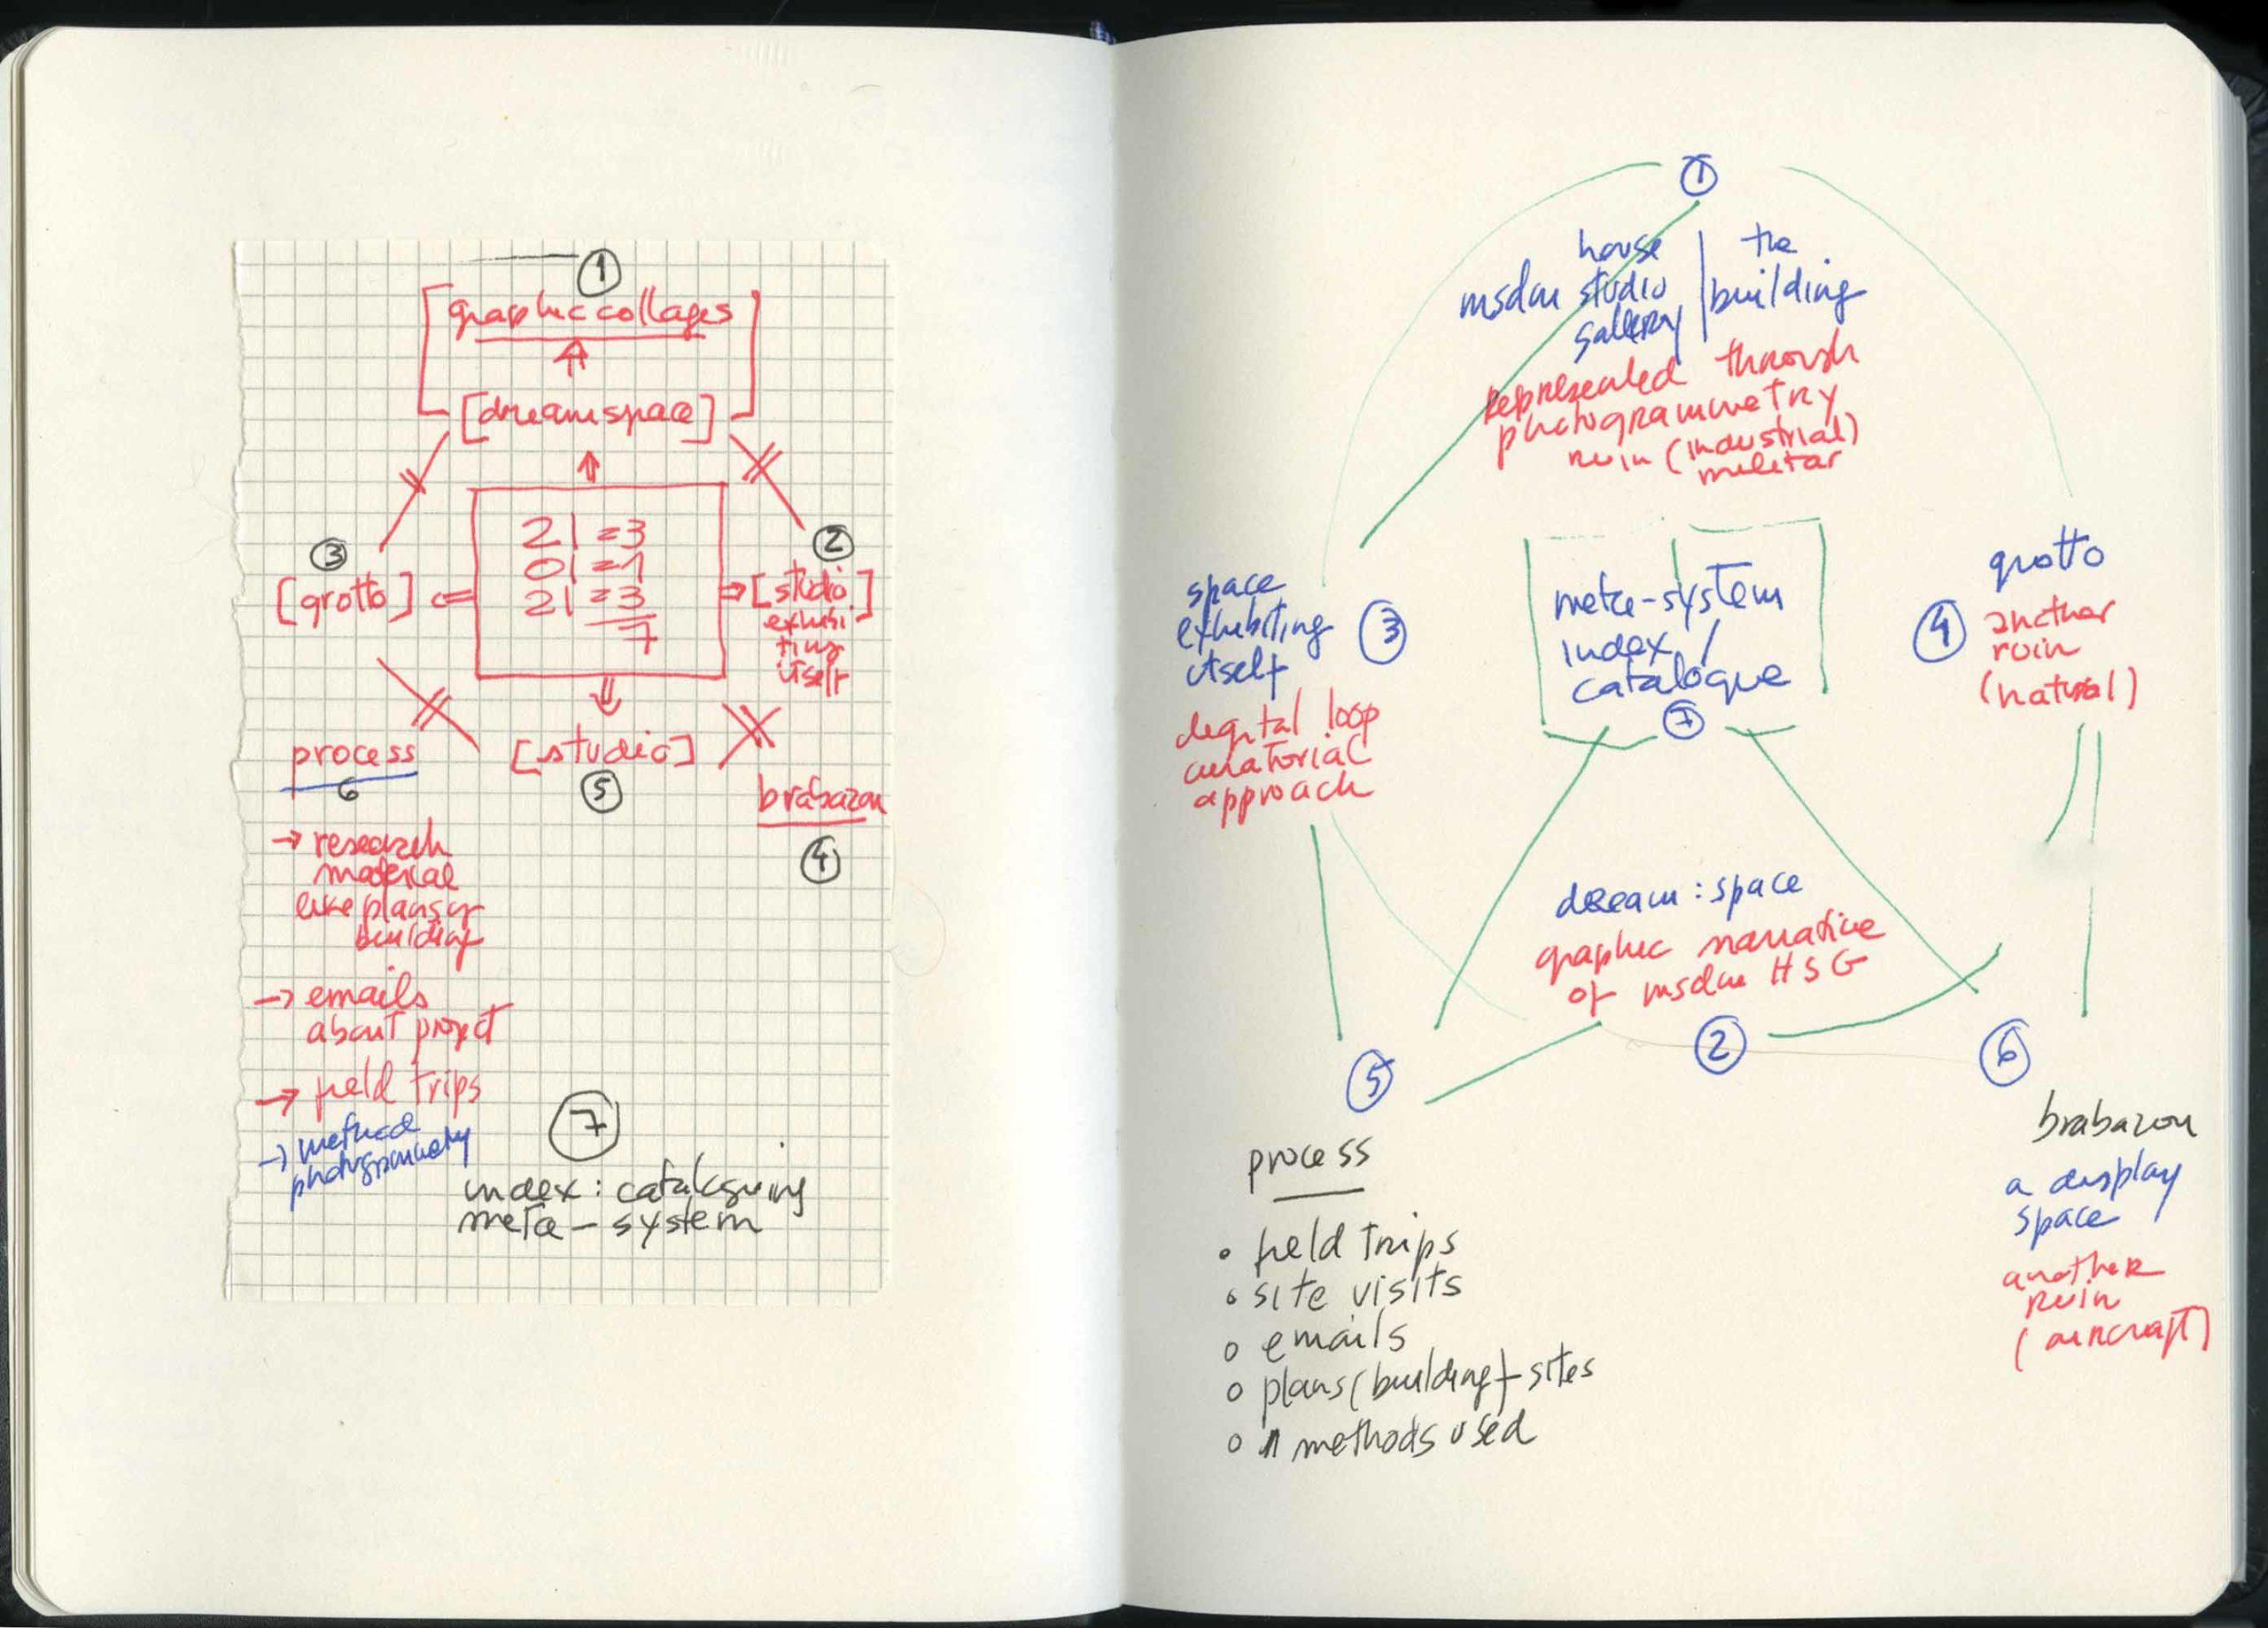 UWE-meta-system-diagram-210121